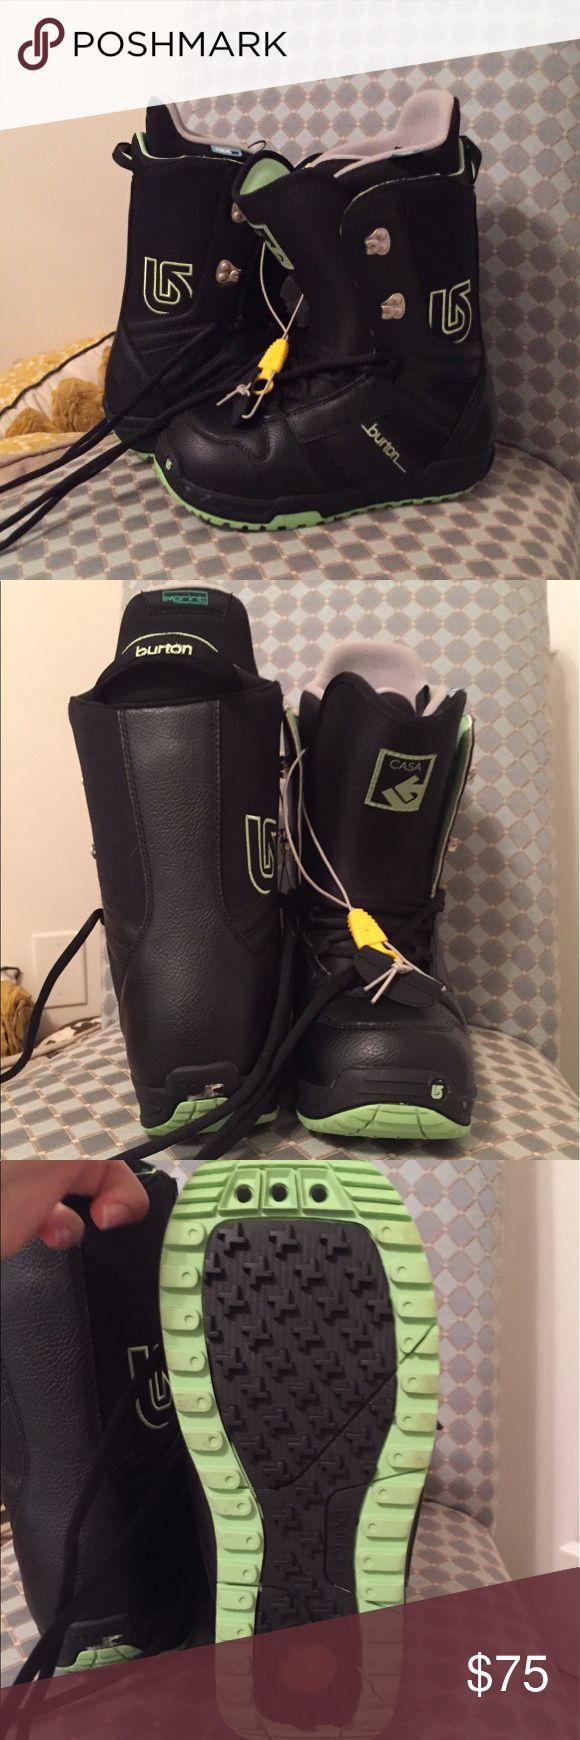 Burton women's casa snowboard boots Like new! Only worn twice, great for beginners! Burton Shoes